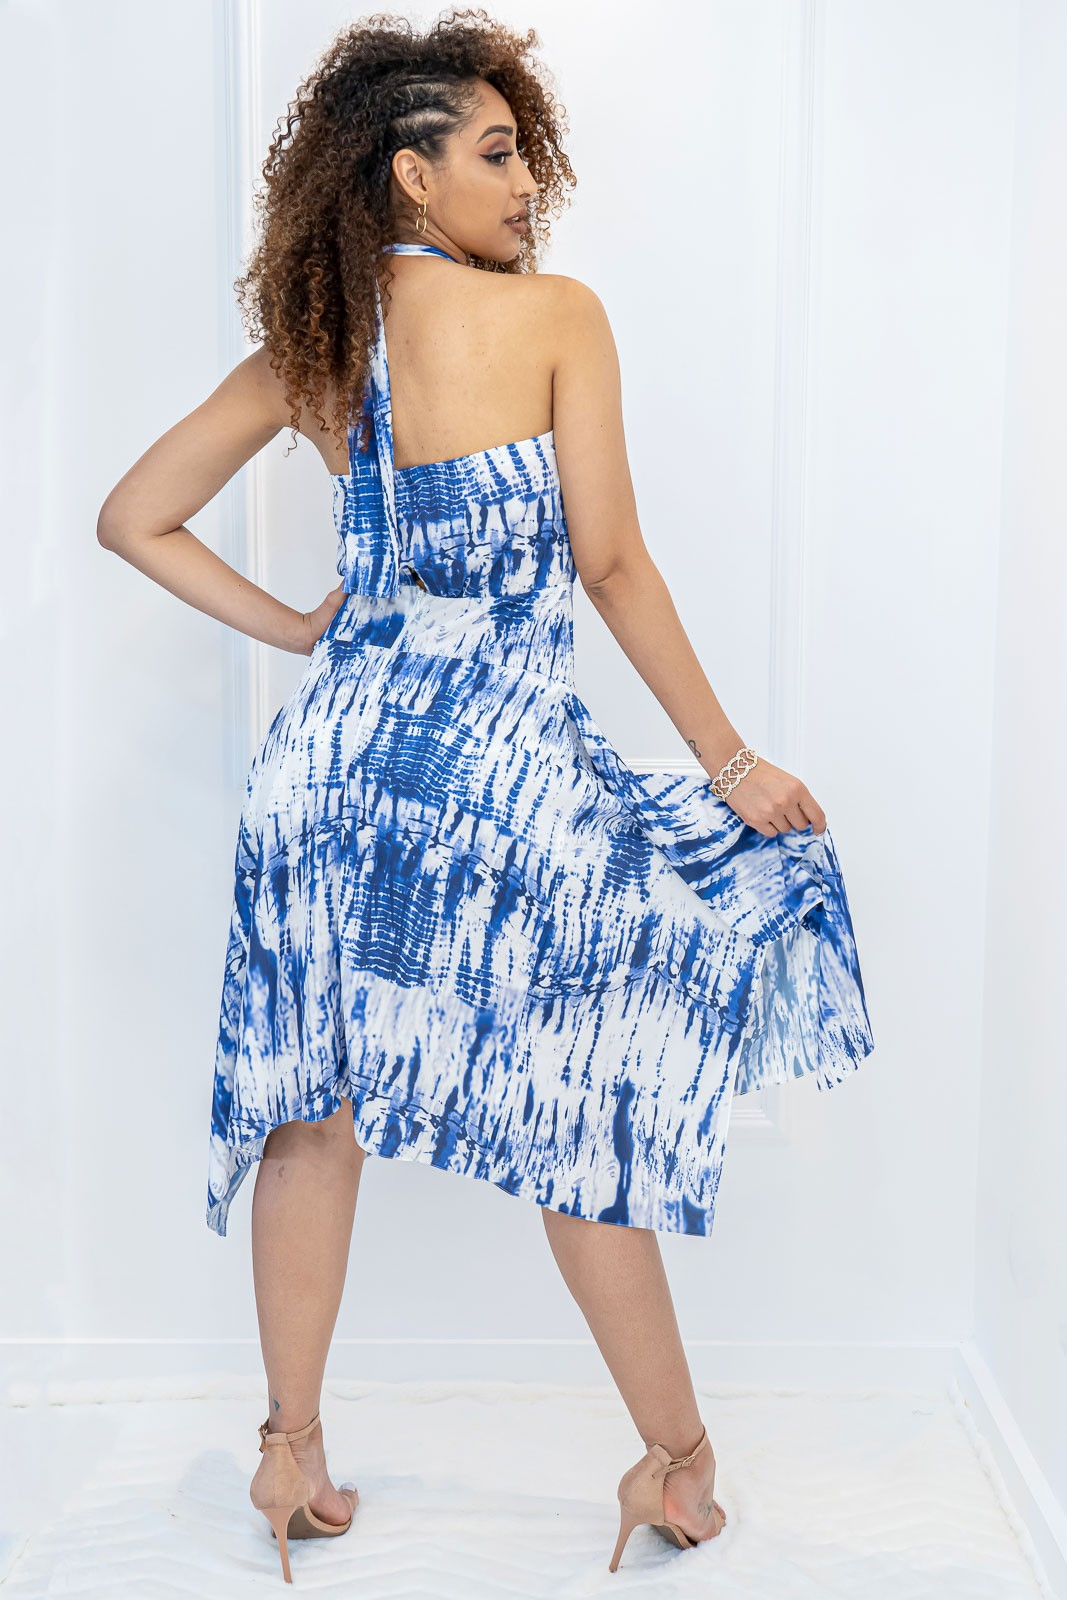 Vestido Midi Frente Única Estampado Azul e Branco